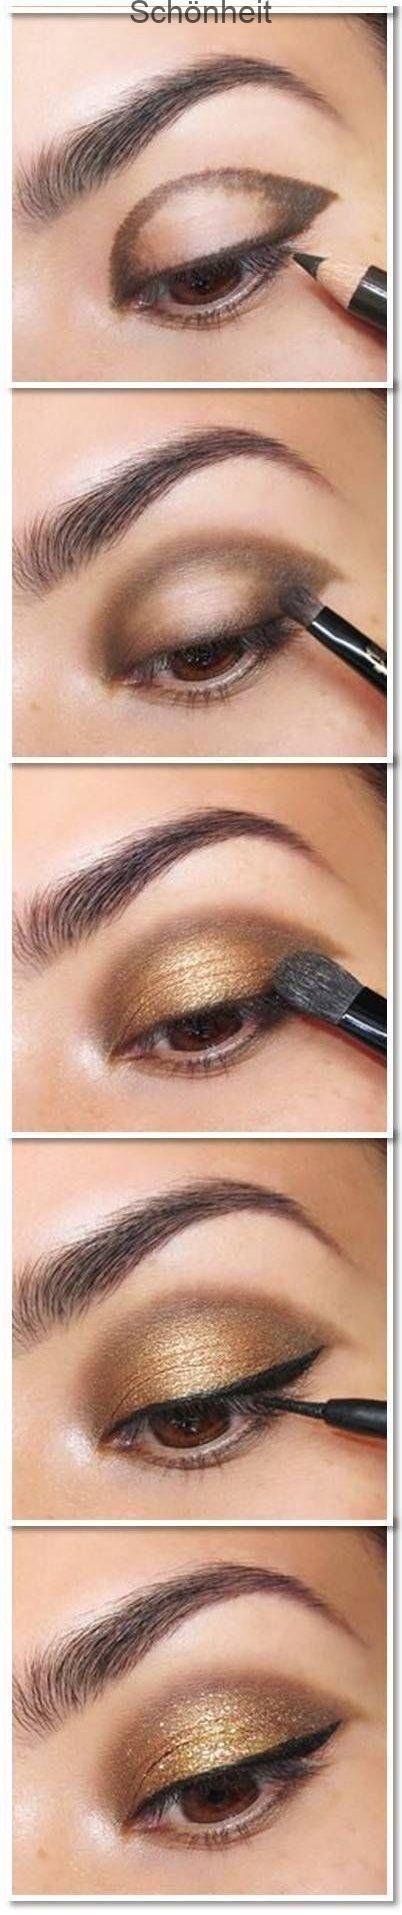 Gold Smoky Eye MakGold Smoky Eye Makeup Tutorial - Gehen Sie zu Pampadour.com für ... , #gehen #makeup #makgold #pampadour #smoky #tutorial